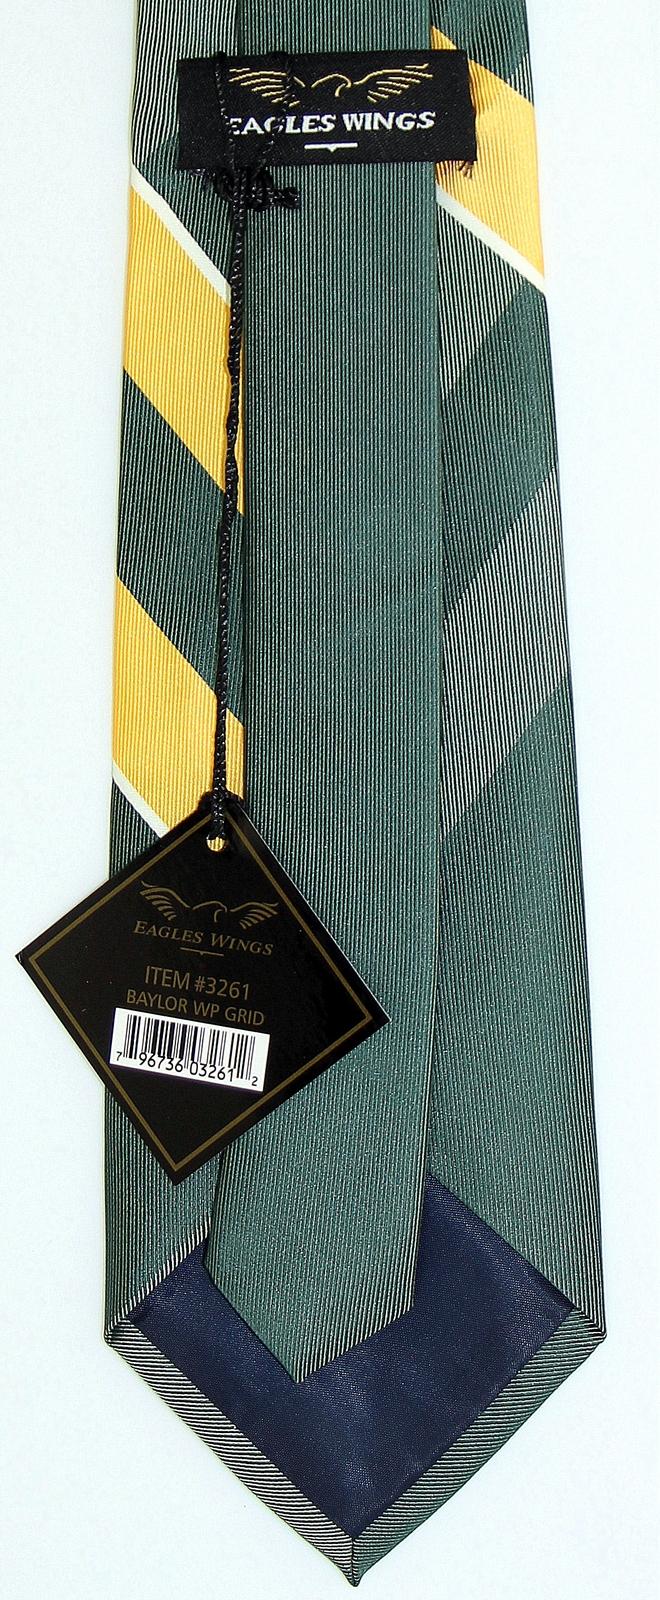 Baylor Bears Mens Necktie College University Logo E. Wings Grid Green Neck Tie  image 3